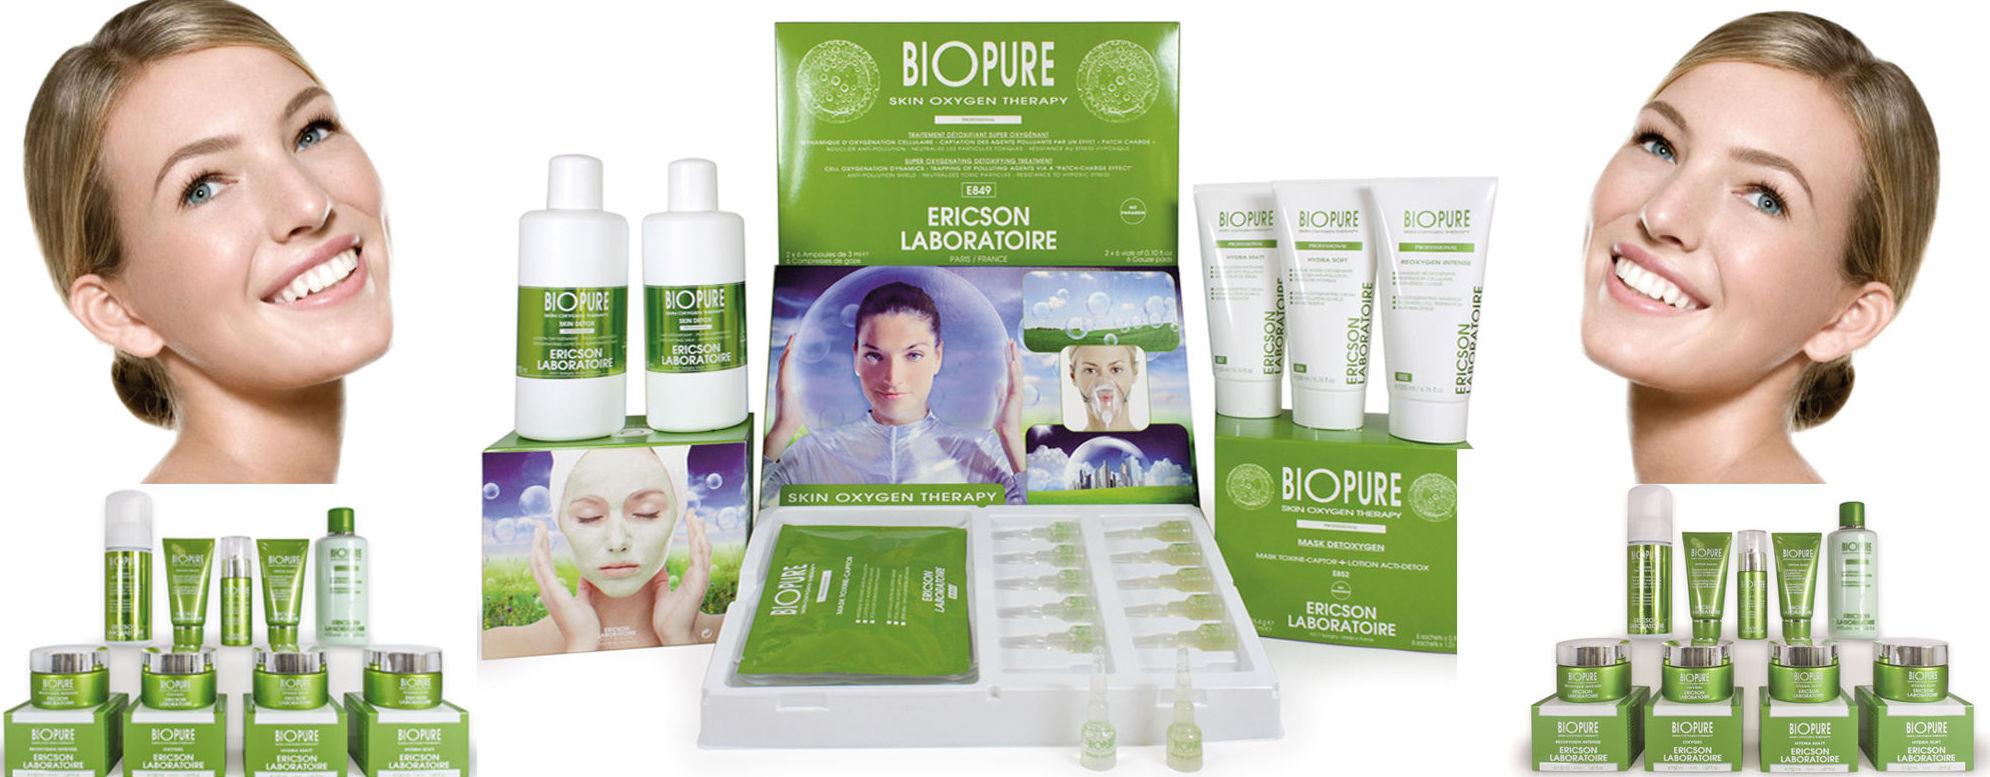 Tratamiento biopure